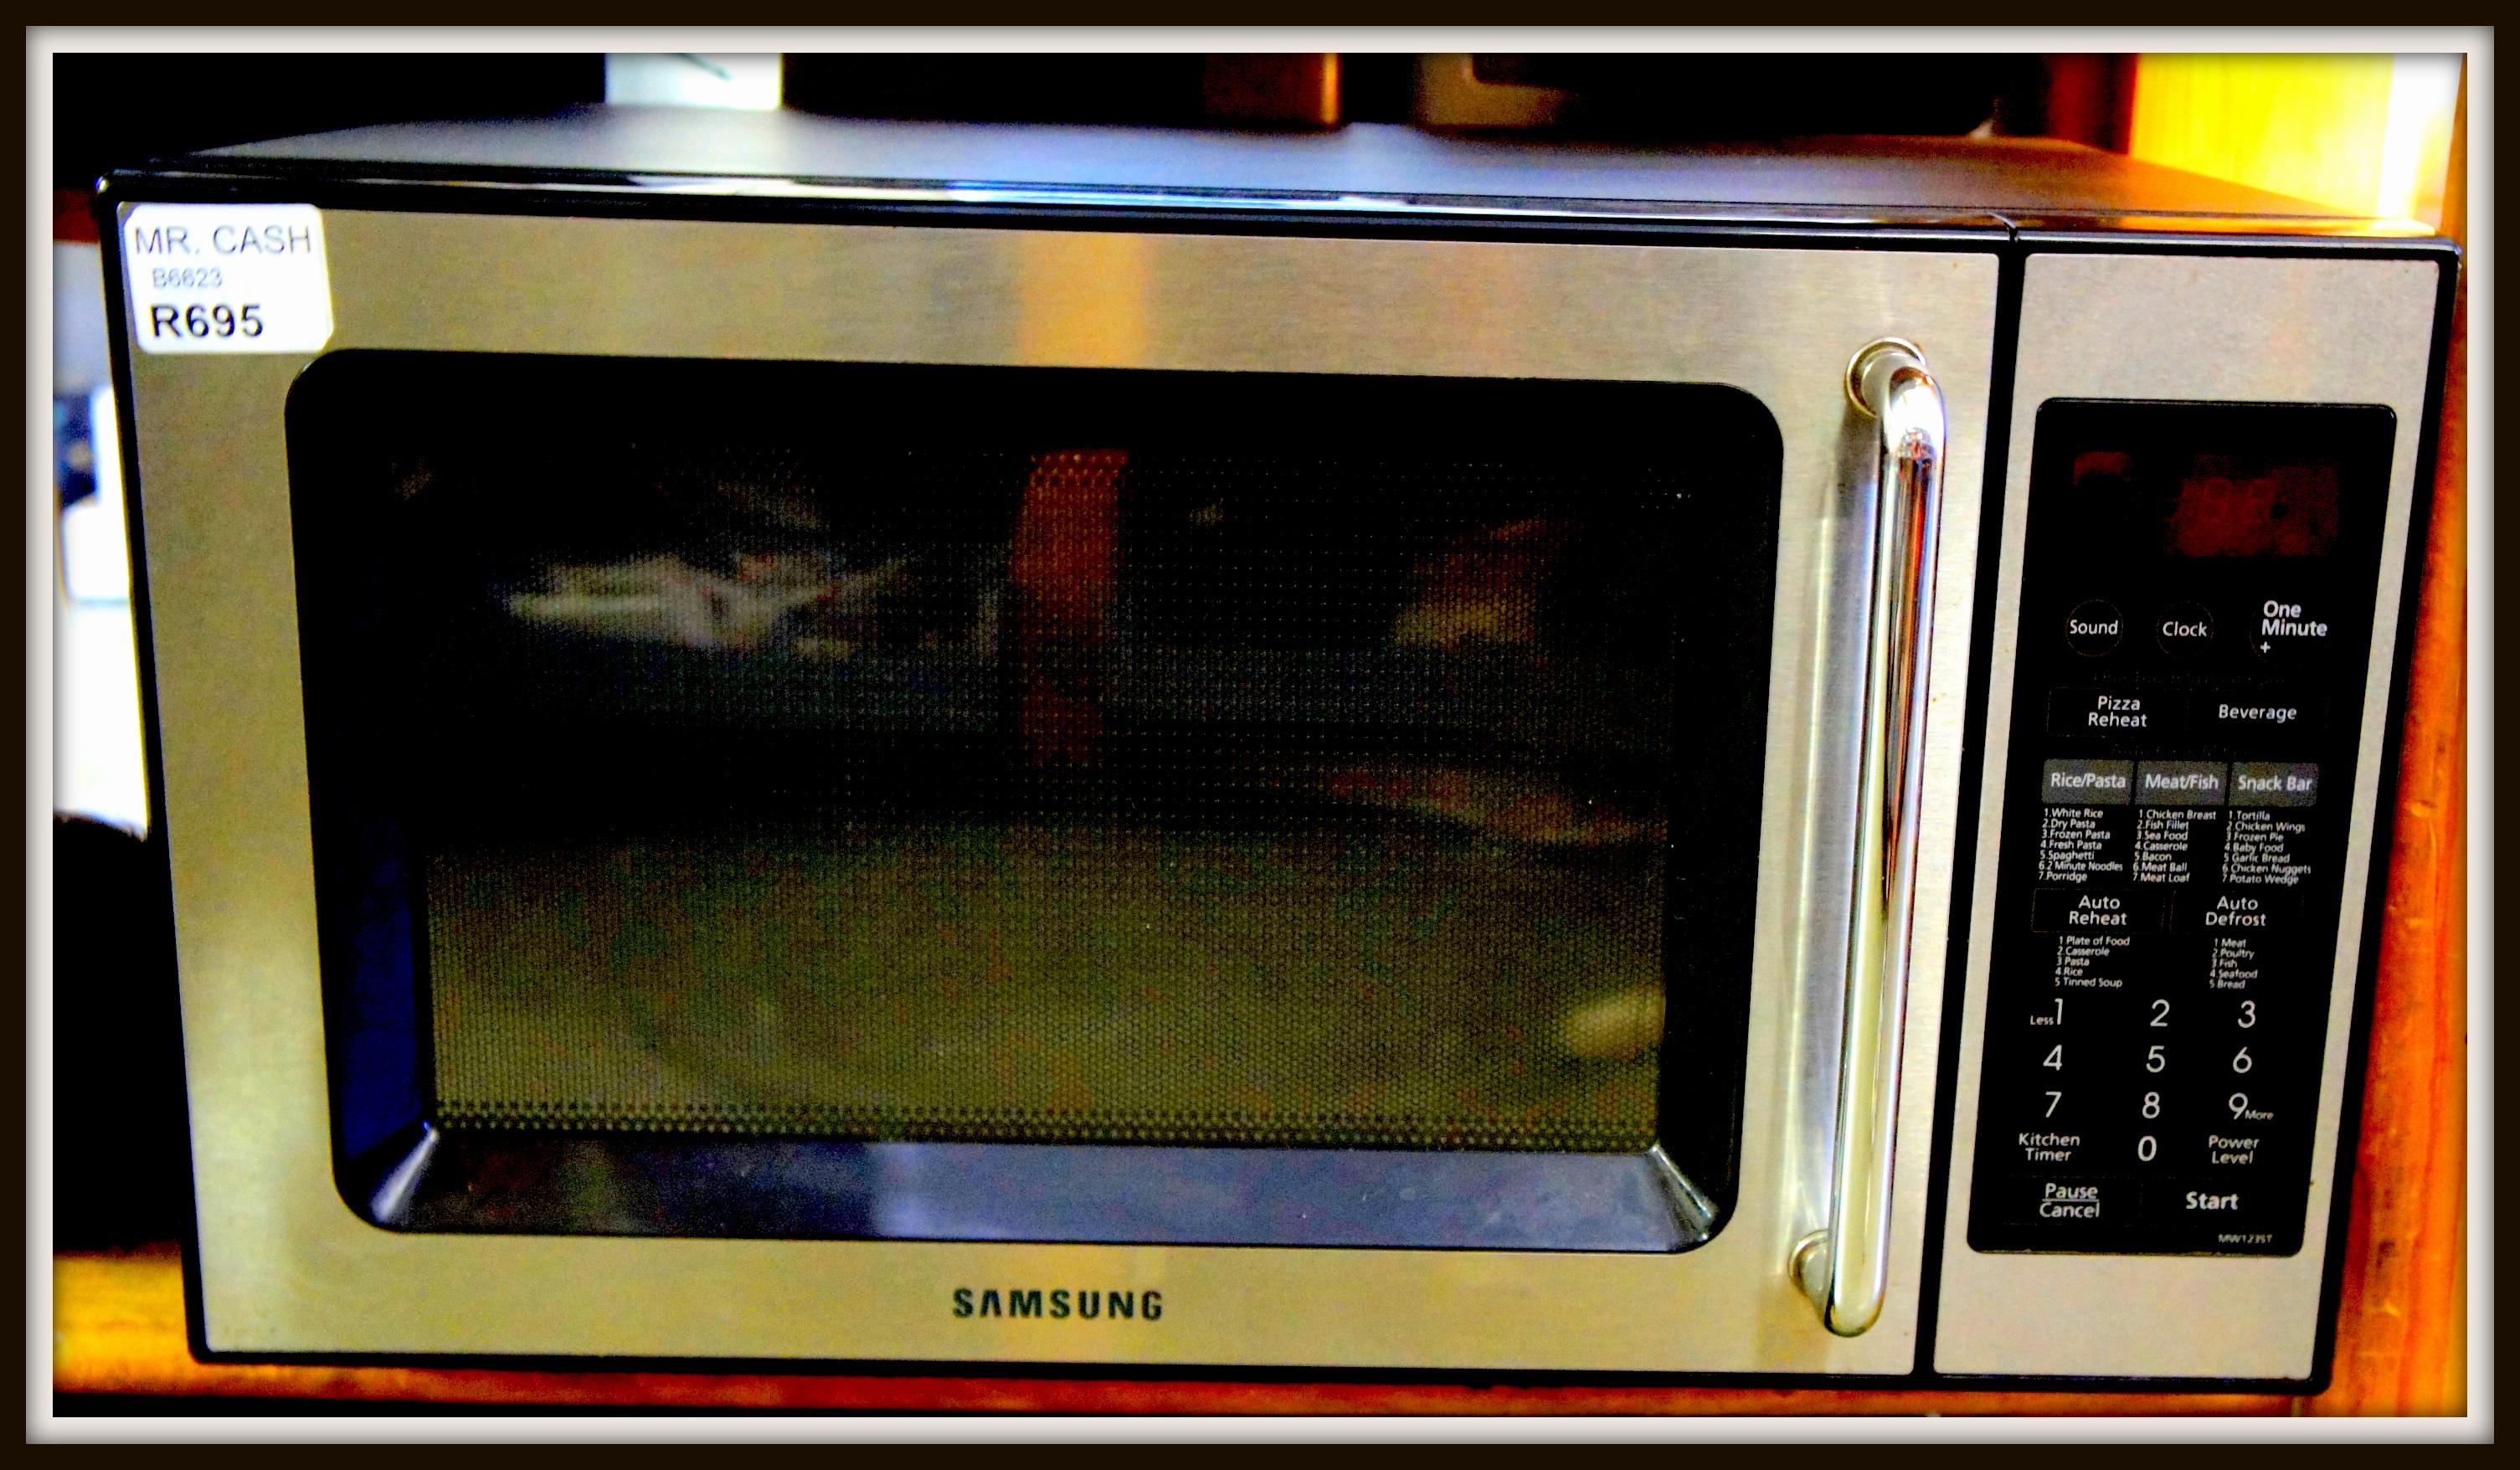 sam microwave B R695 - Copy